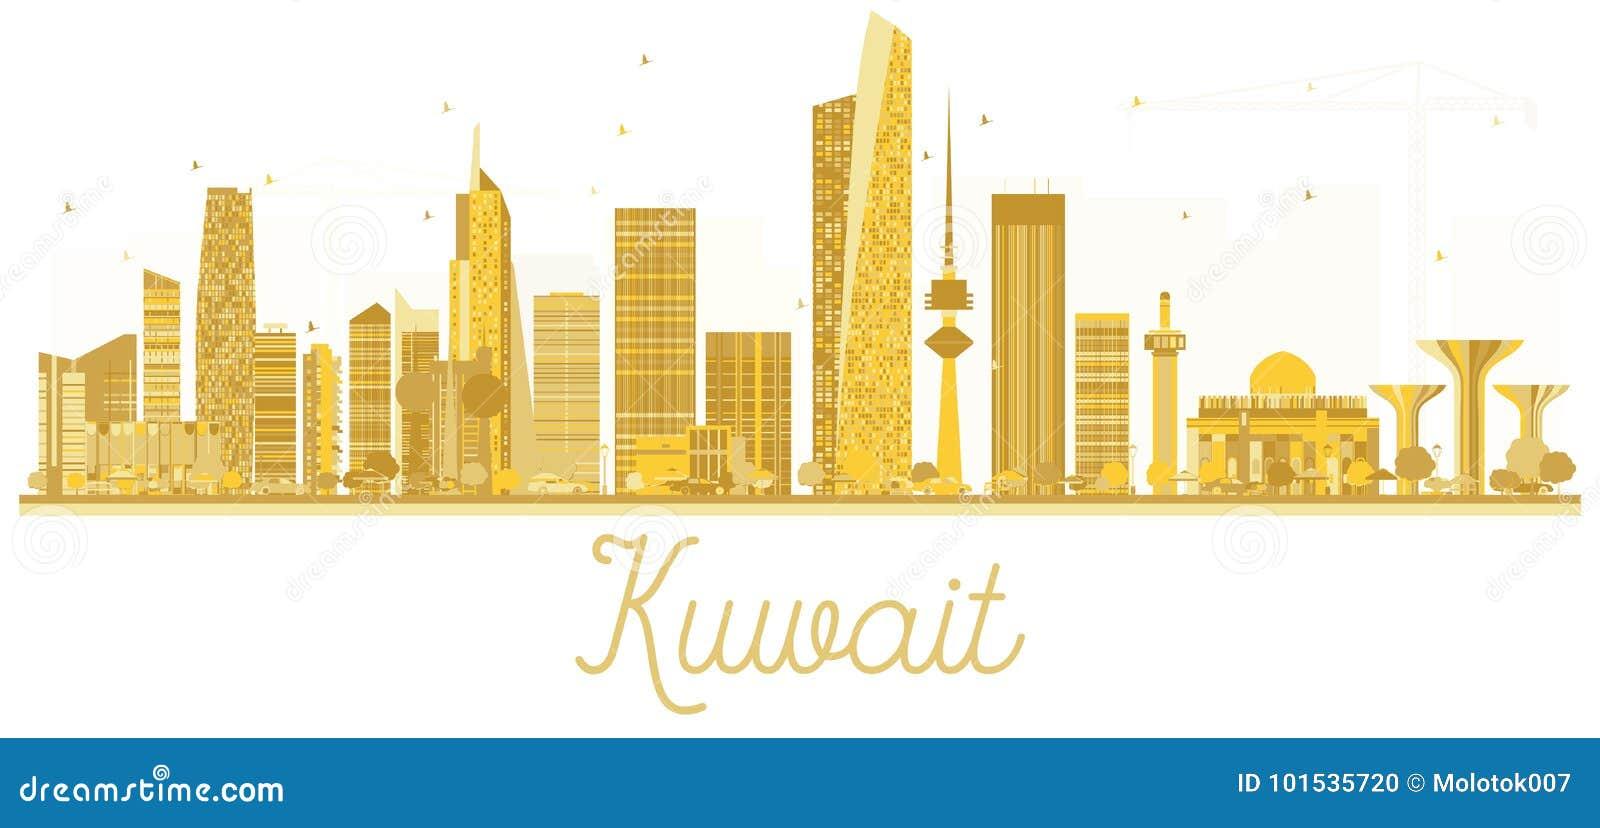 Kuwait City Skyline Golden Silhouette  Stock Vector